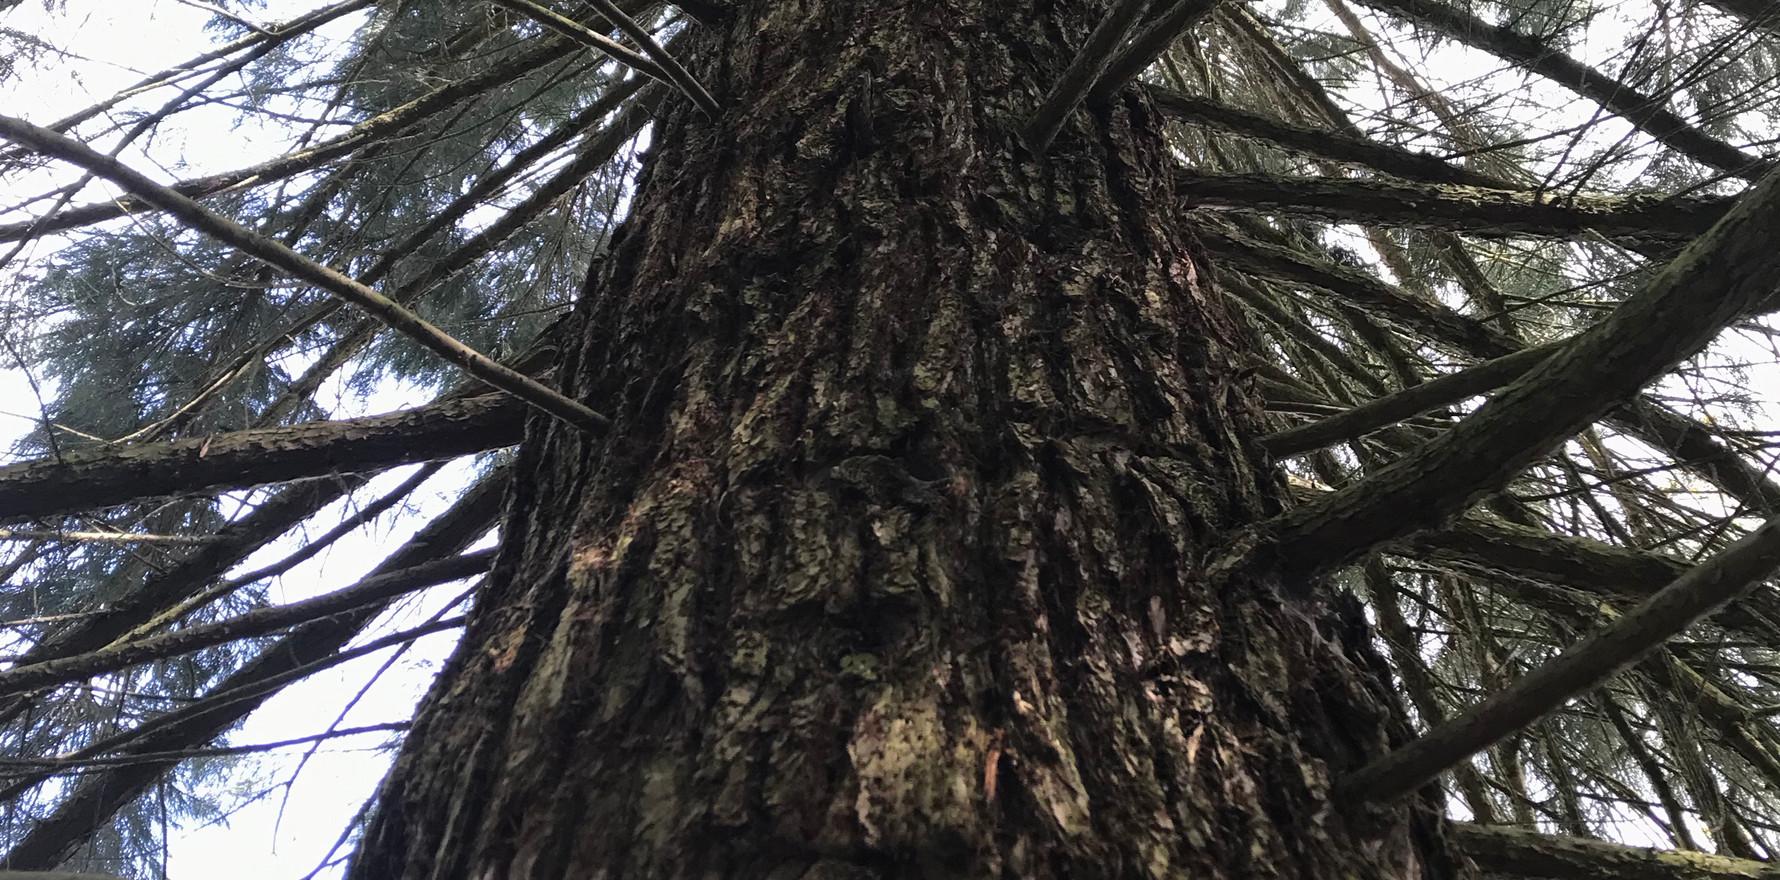 Können Bäume sprechen?